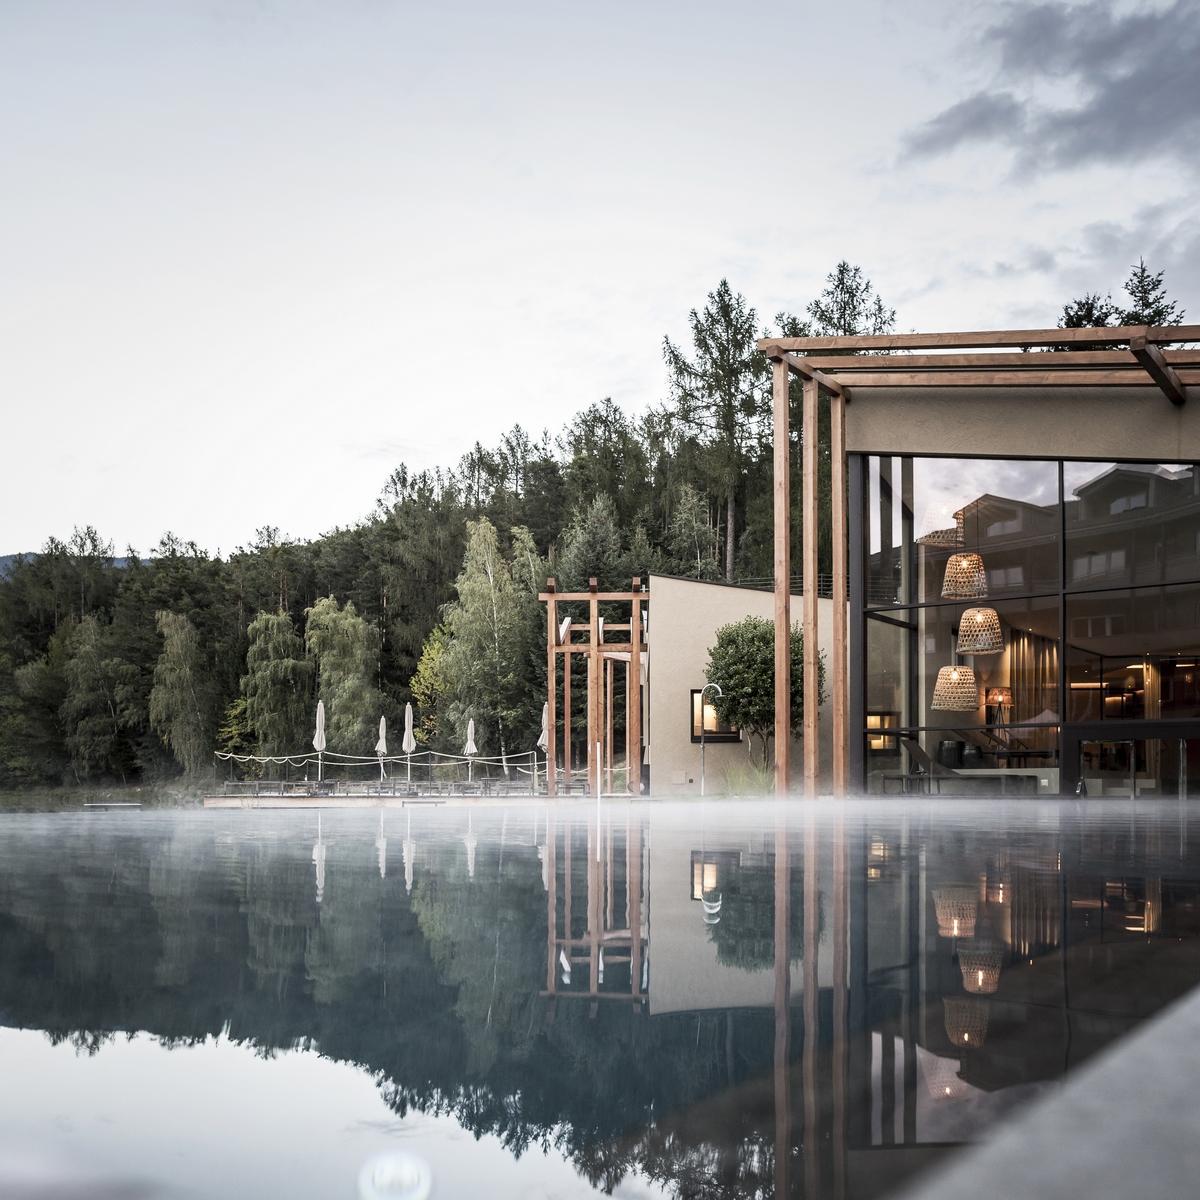 64880-221613-seehof-a-garden-architecture-5 (Copiar)